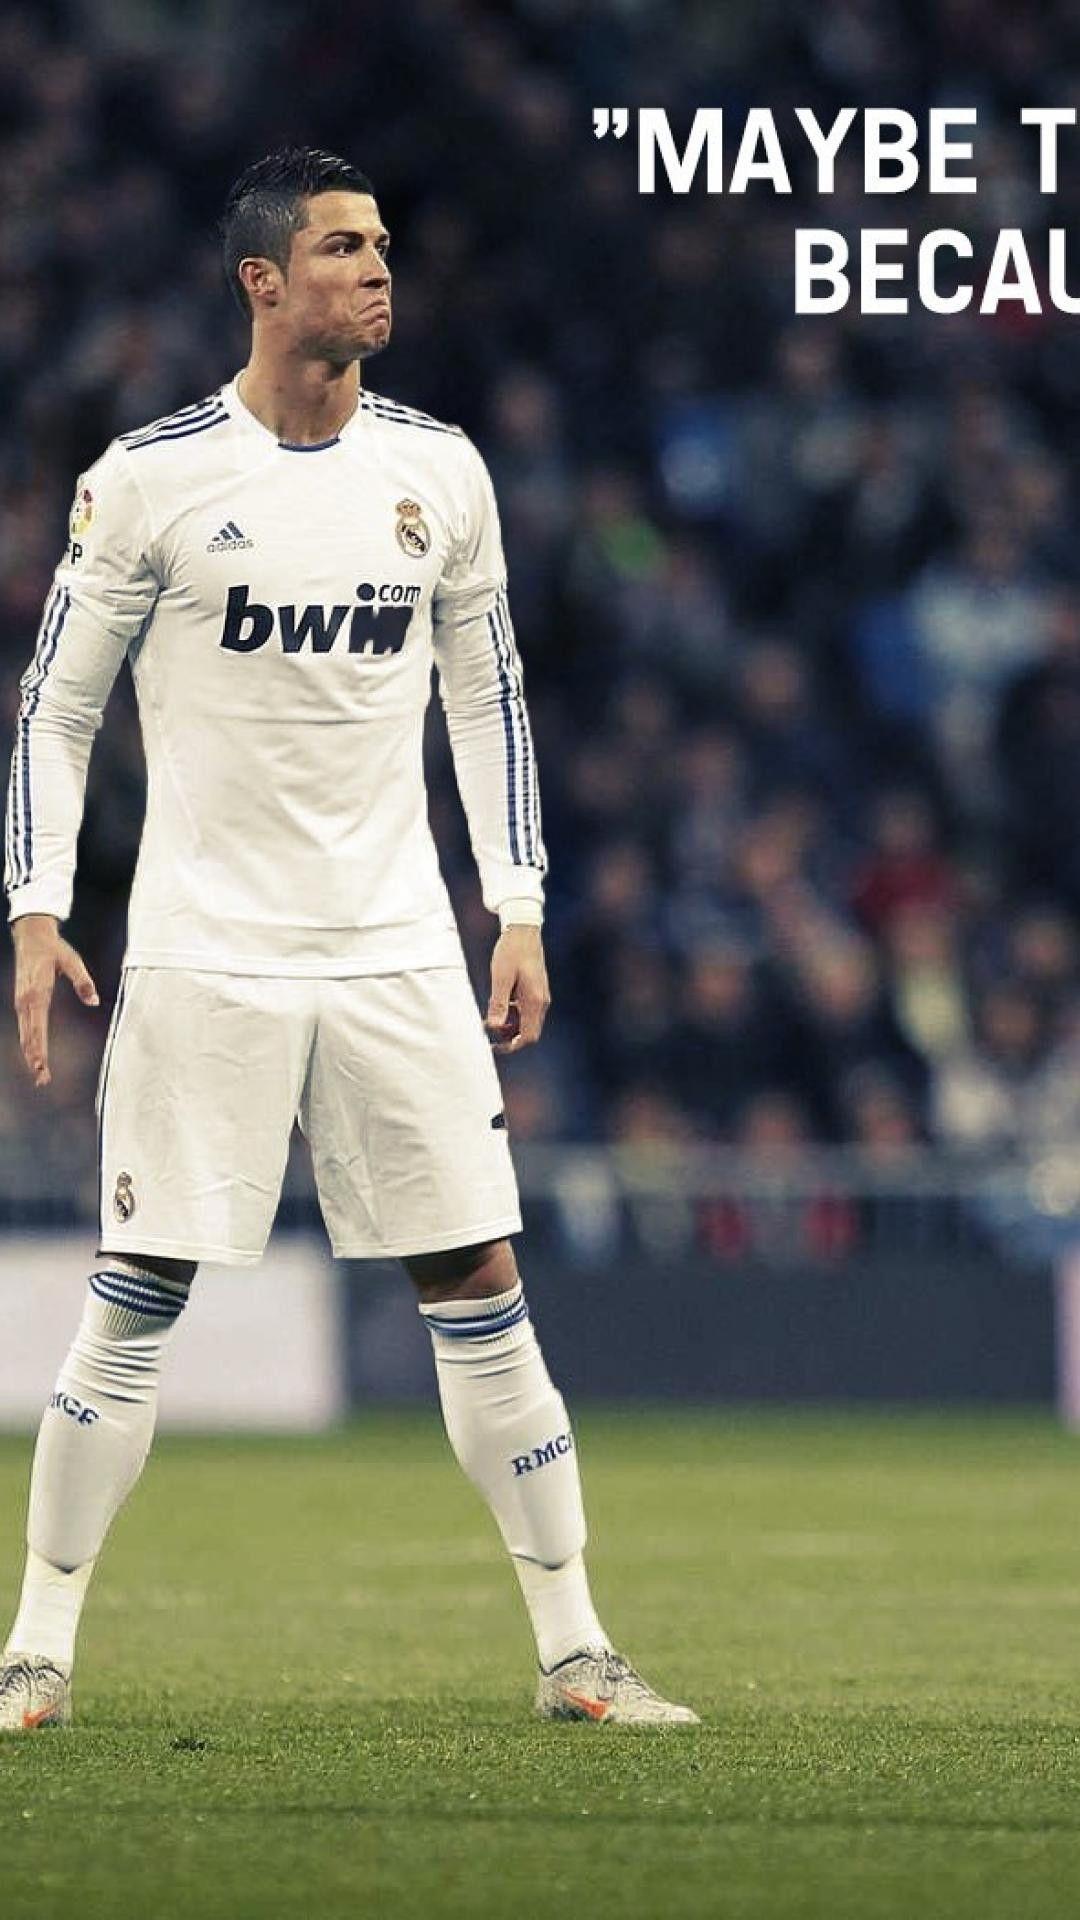 Ronaldo Wallpapers Top Free Ronaldo Backgrounds Wallpaperaccess